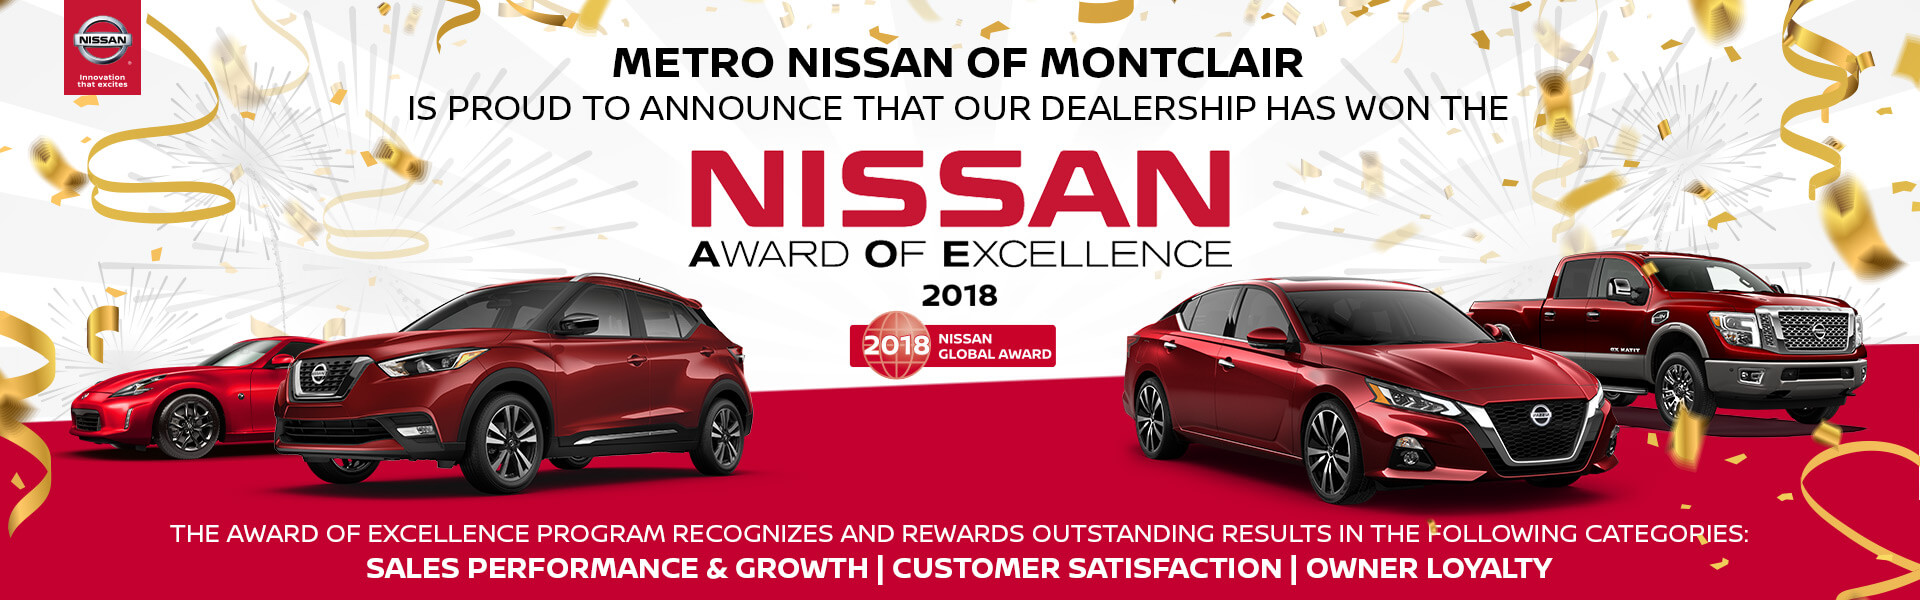 Nissan Dealership Los Angeles >> New Nissan And Used Cars Near Pomona And Ontario Ca Metro Nissan